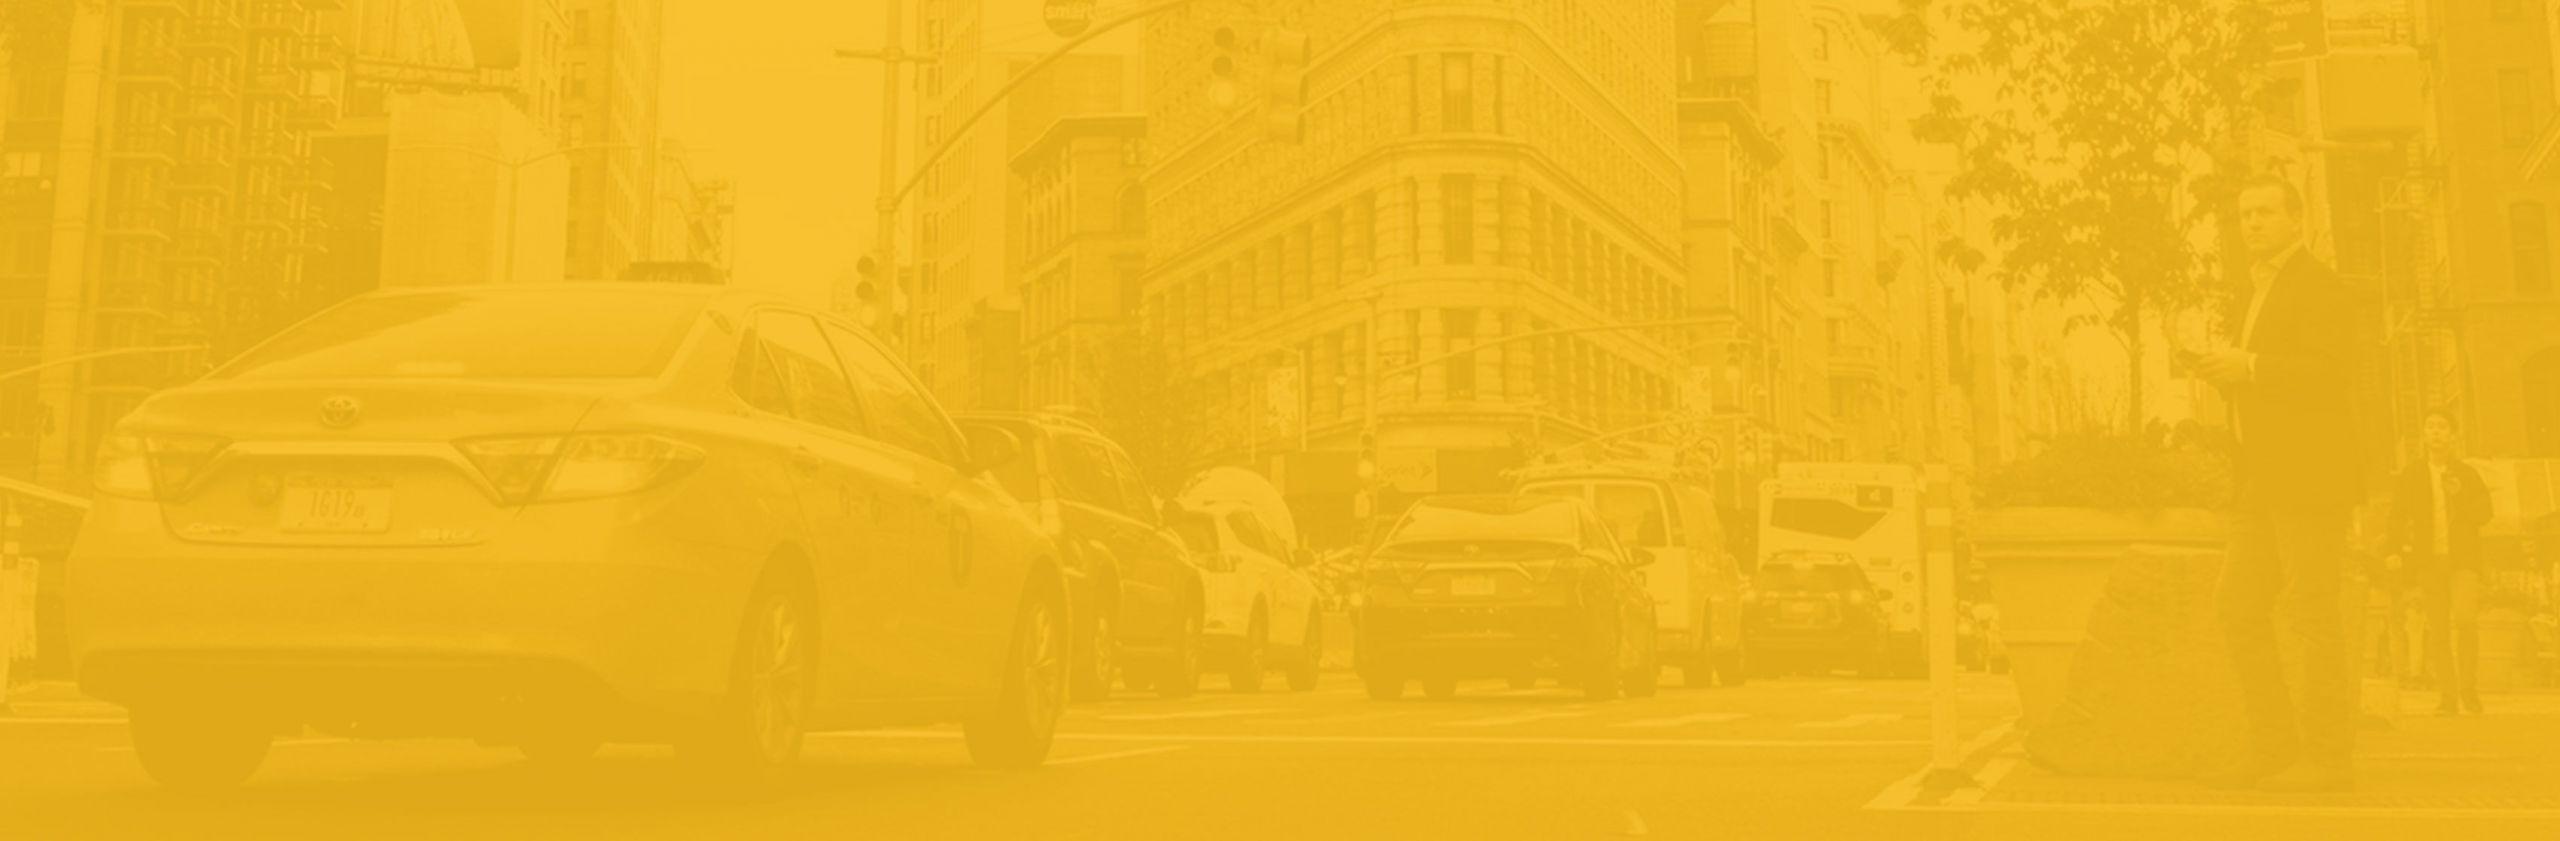 avada-taxi-app-background